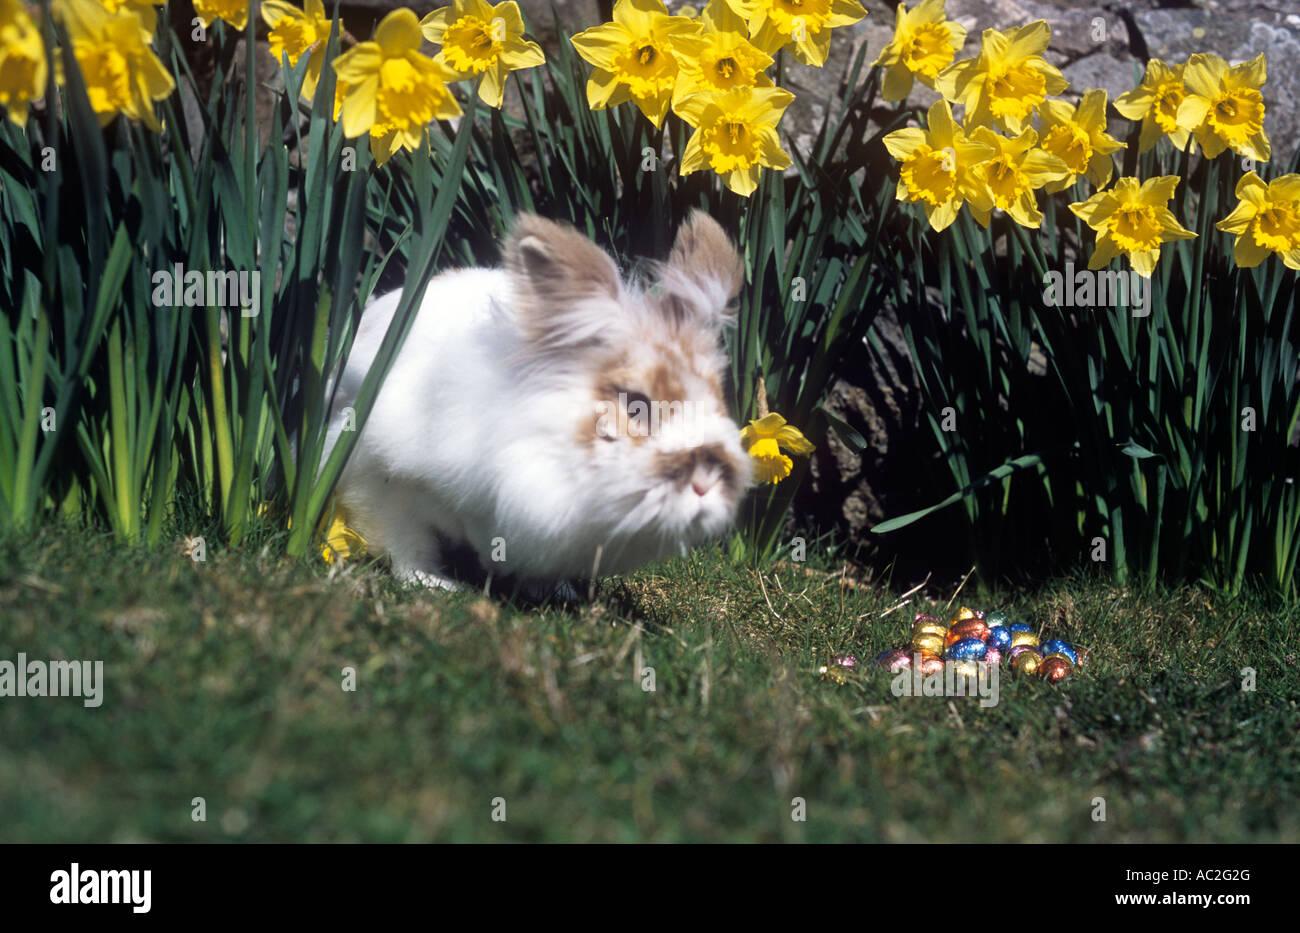 Lapin de Pâques! Photo Stock